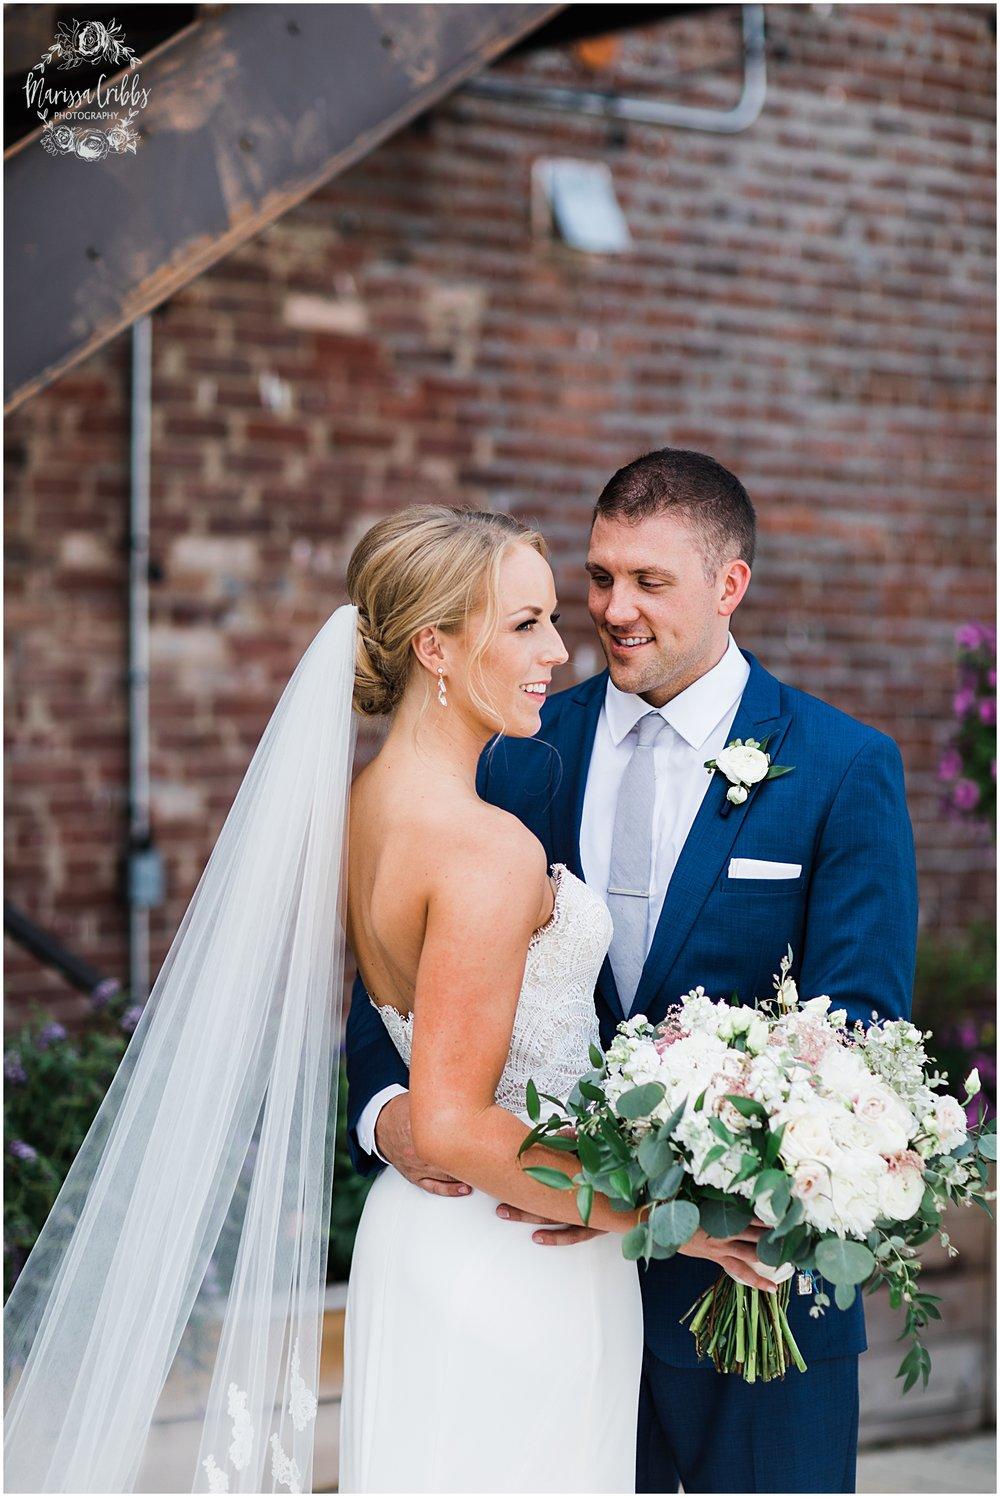 MAGNOLIA VENUE WEDDING | CHARLIE & NATALIE | MARISSA CRIBBS PHOTOGRAPHY_5739.jpg